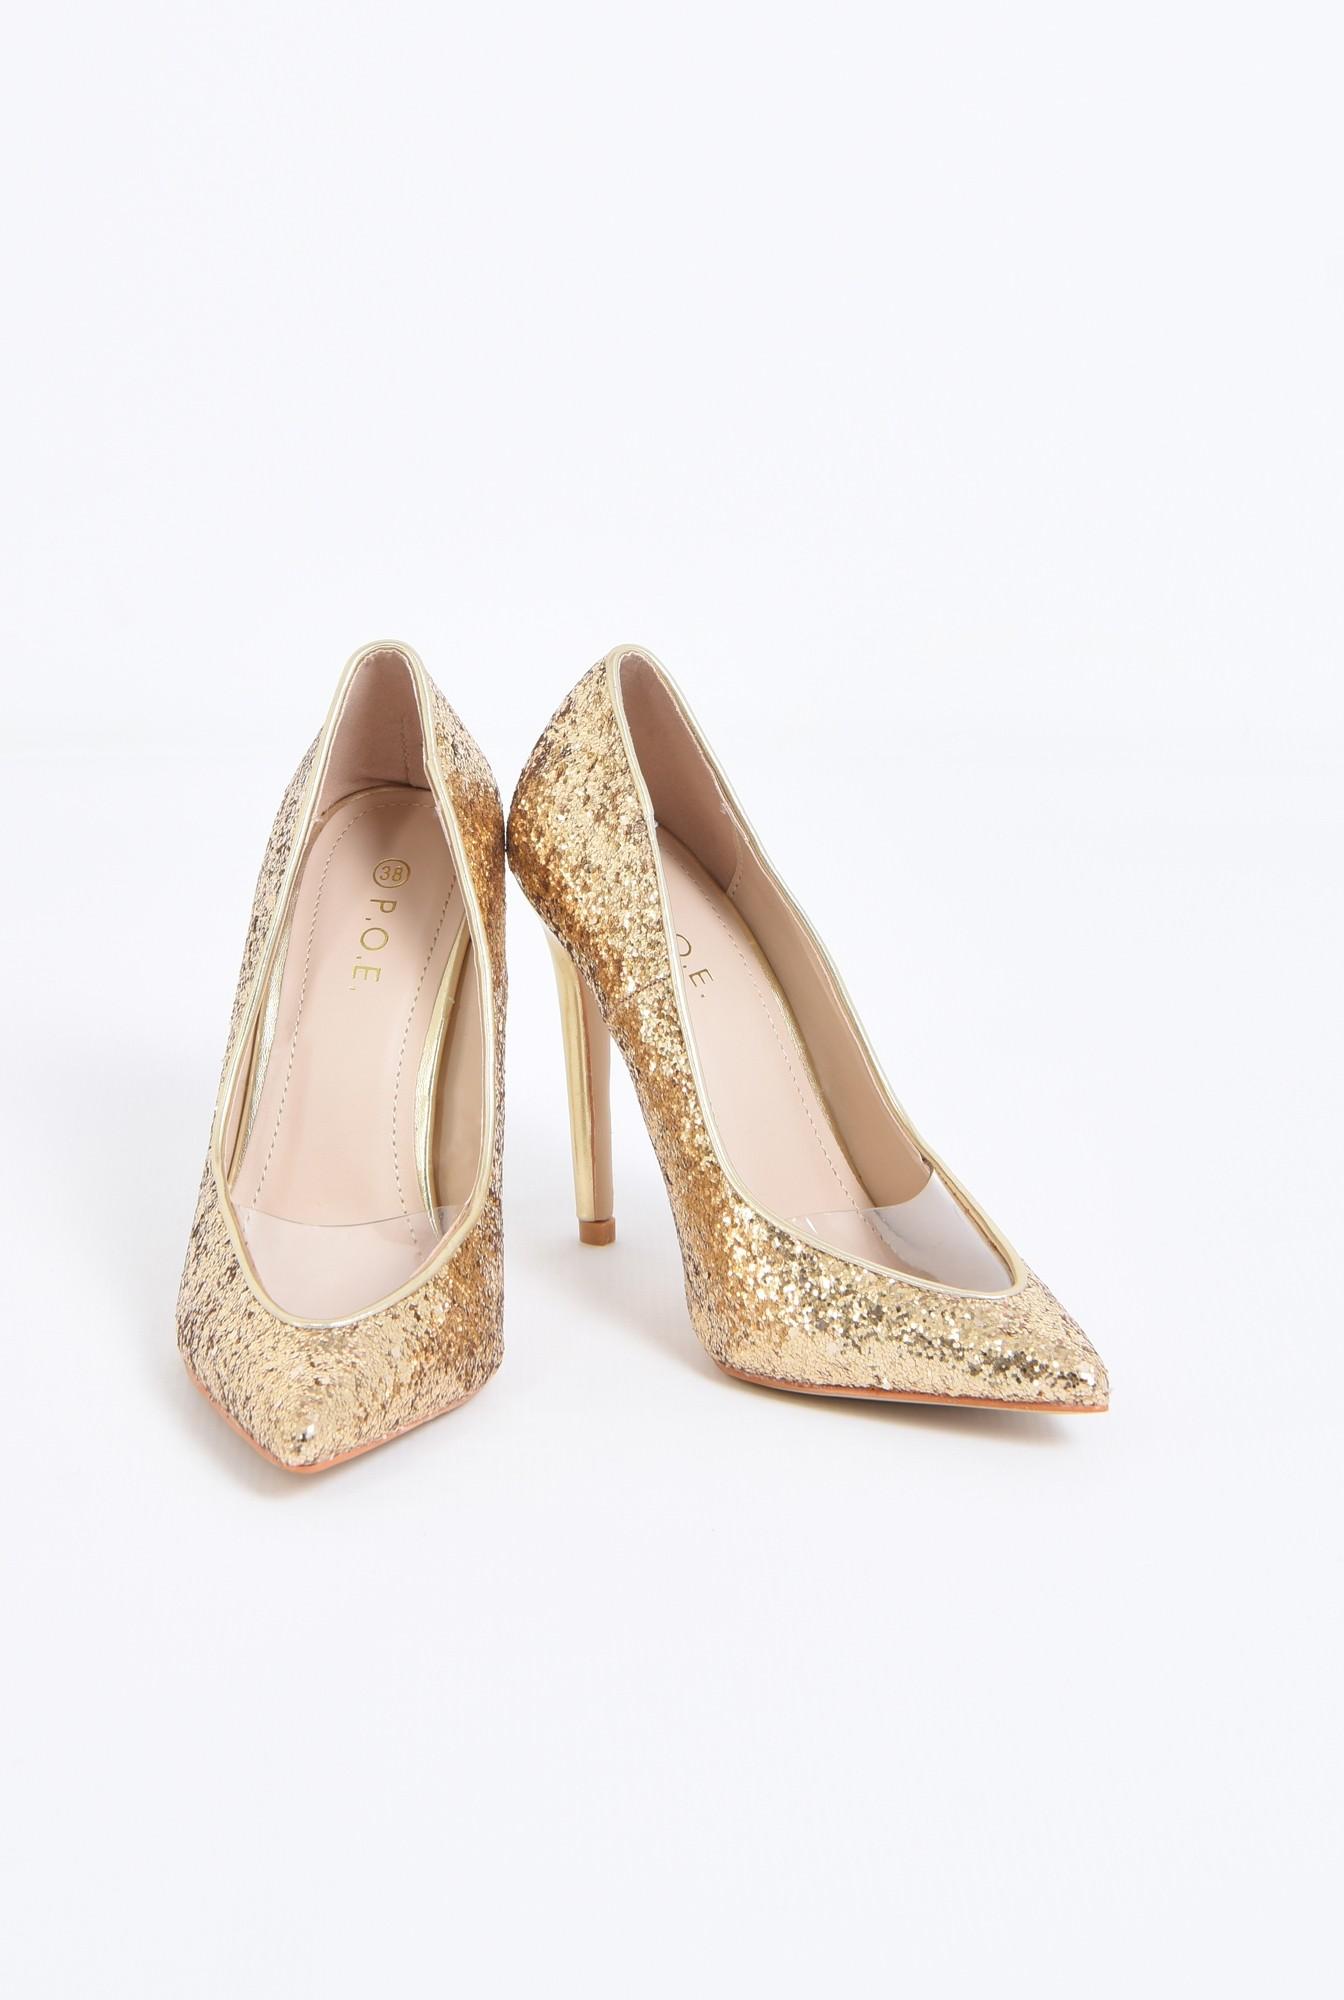 3 - pantofi eleganti, auriu, stiletto, glitter